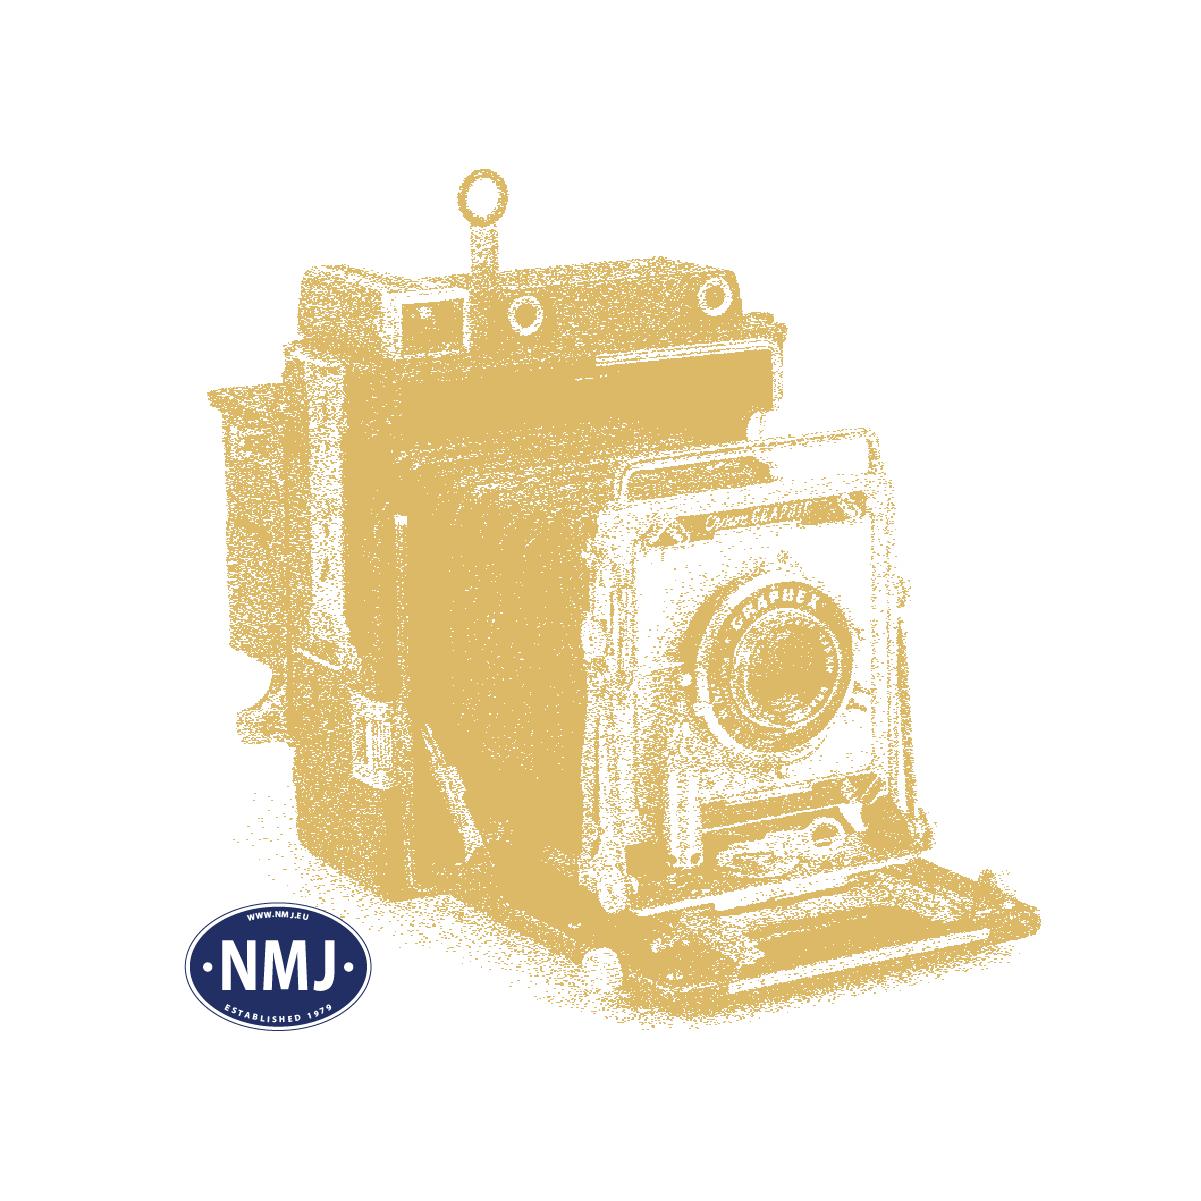 NMJT604.503 - NMJ Topline BJ G 745